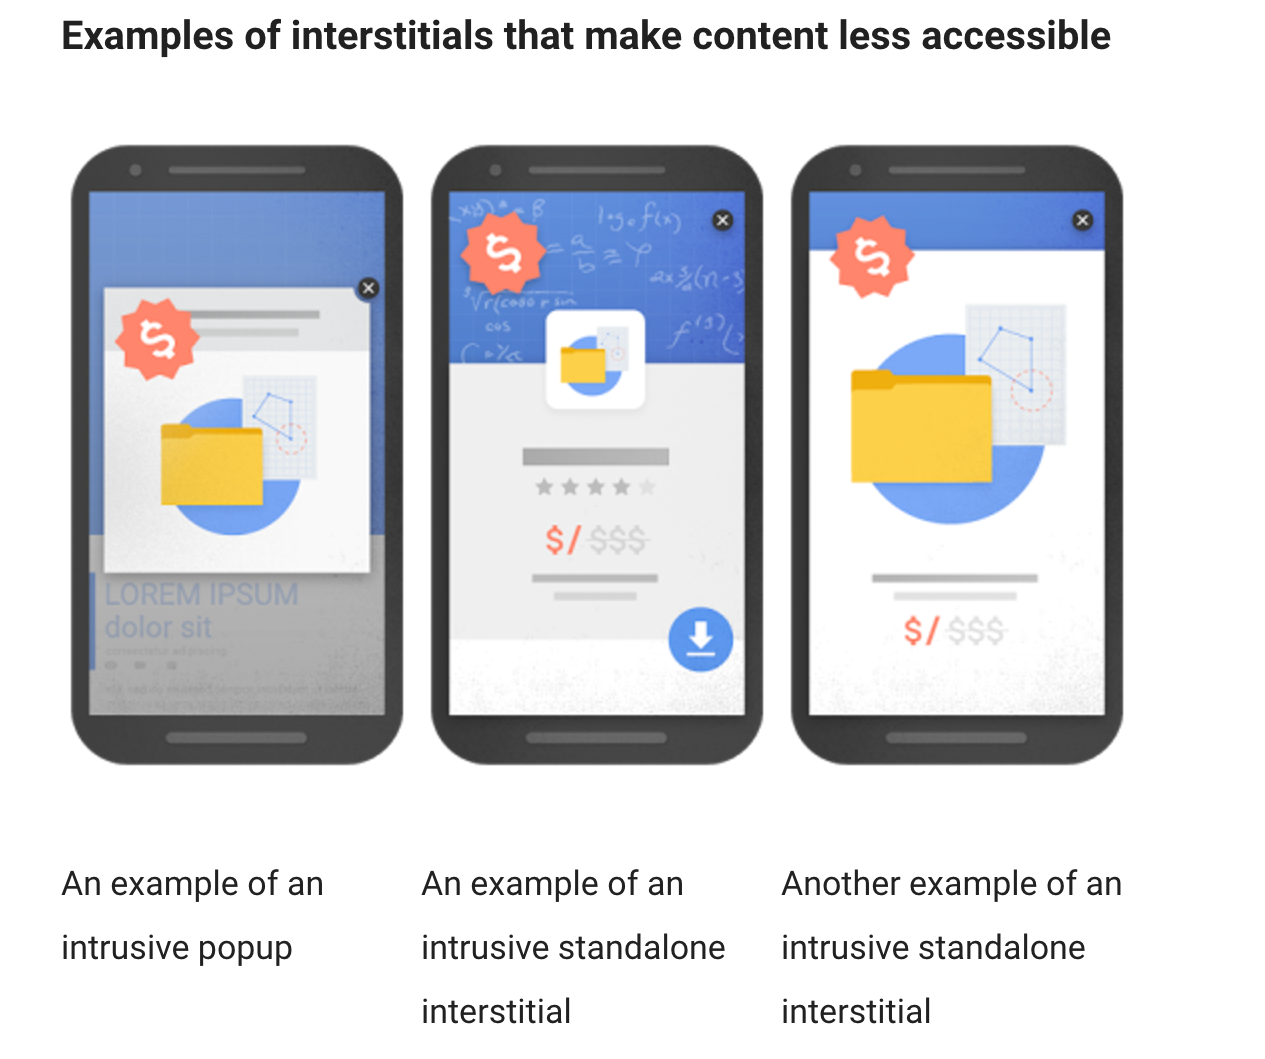 Intrusive interstitial ads that Google has begun penalizing in 2017.